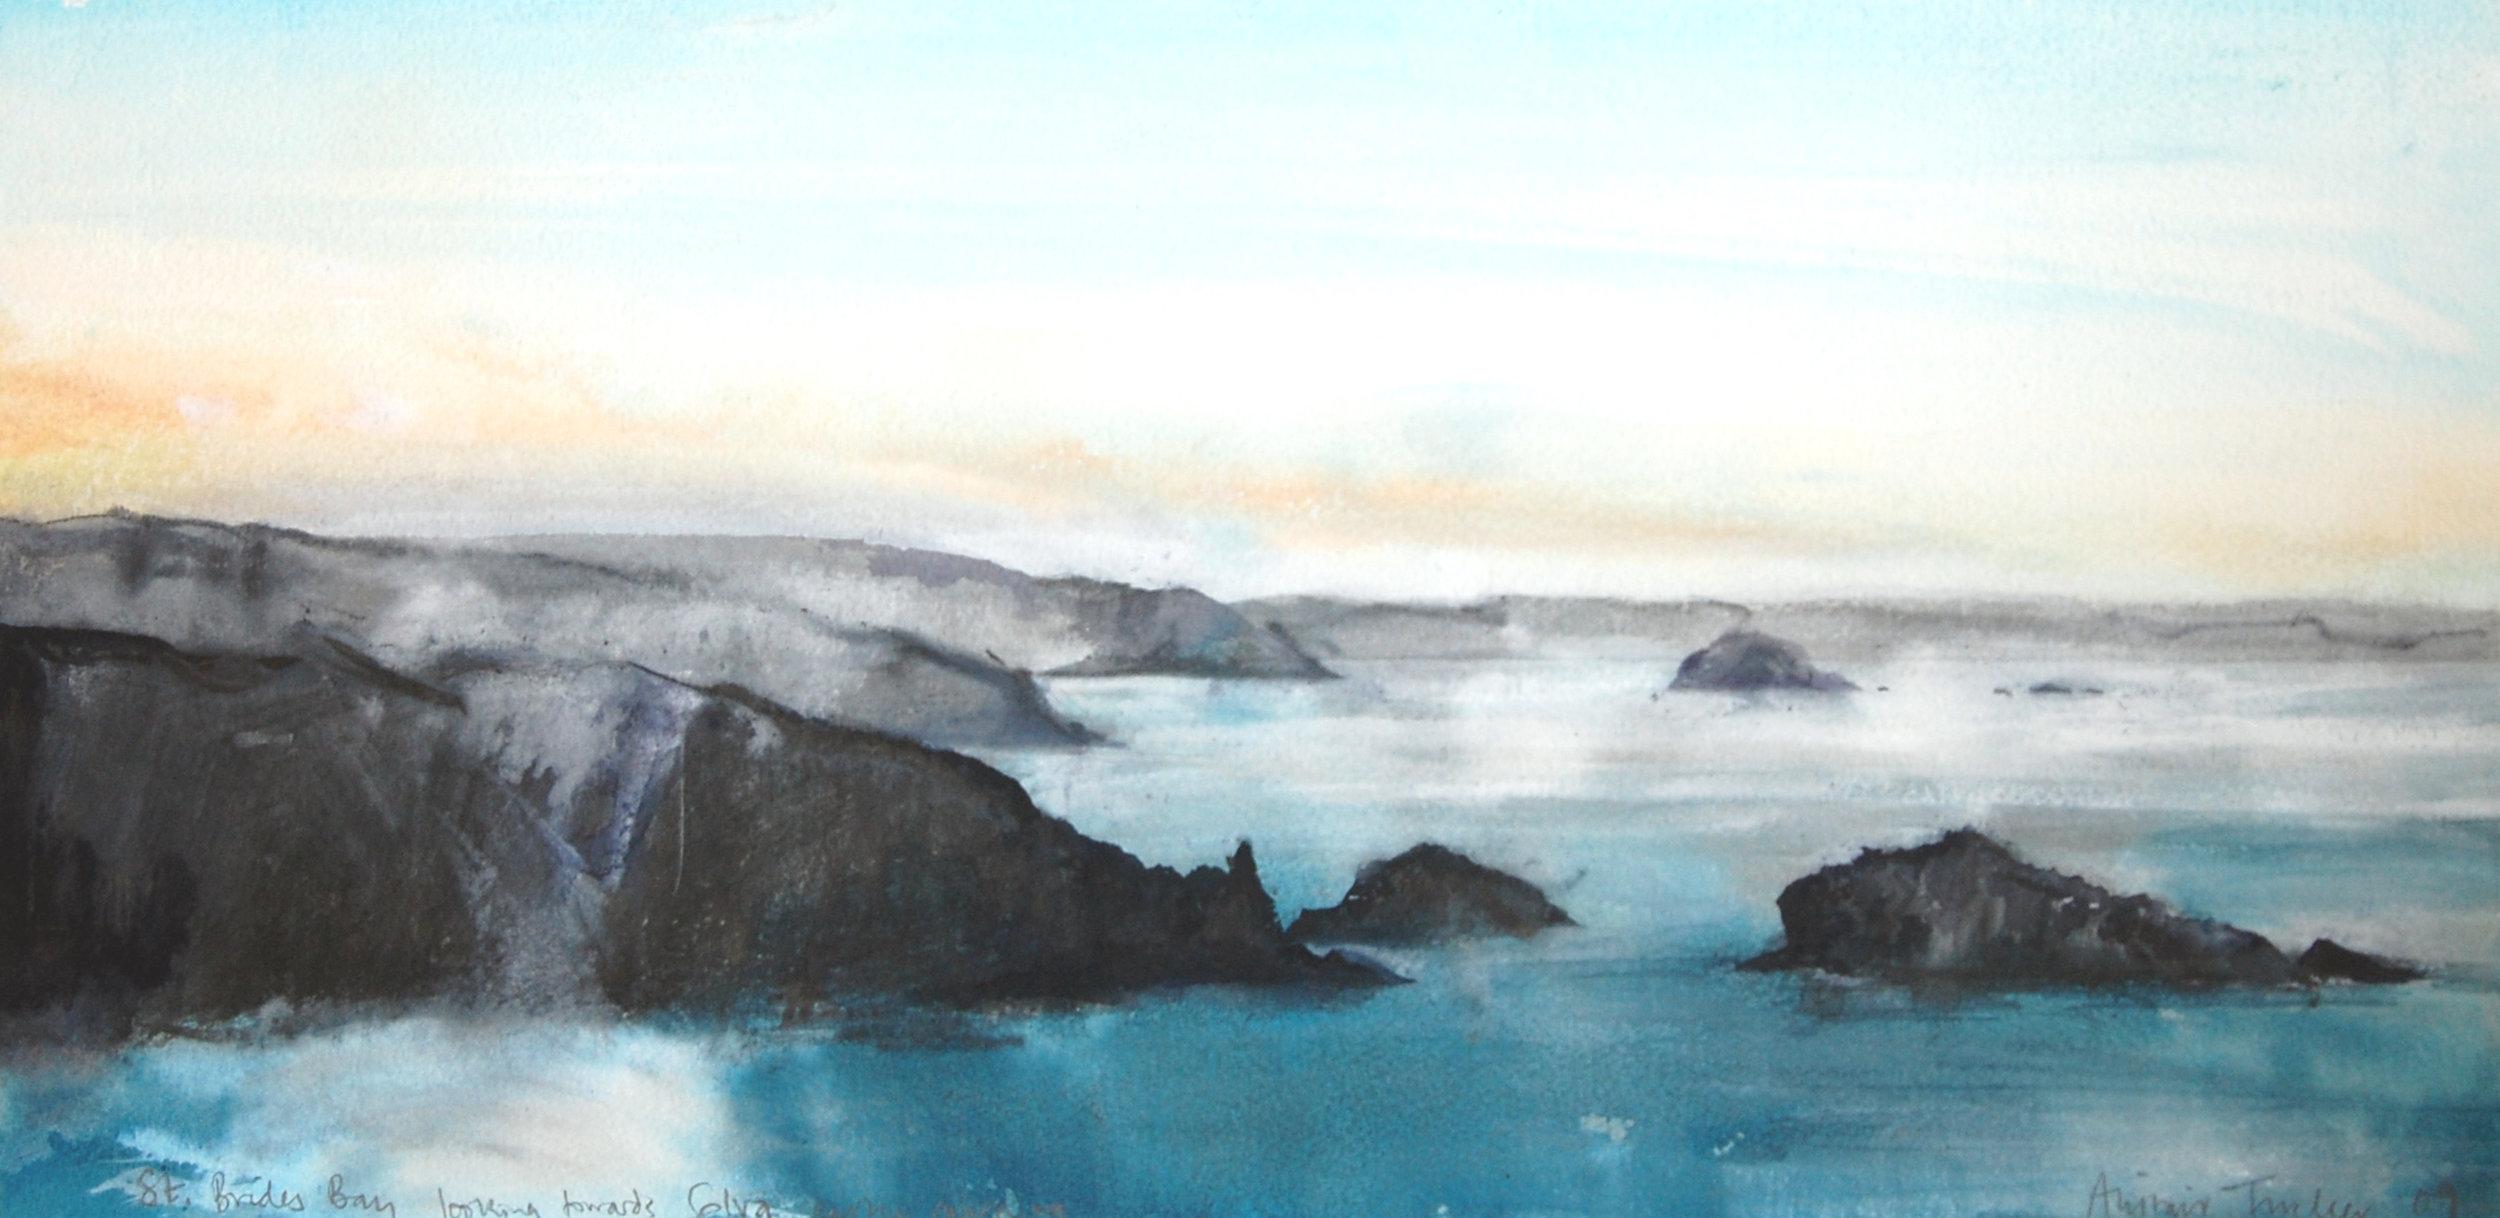 St Brides Bay looking towards Solva early morning